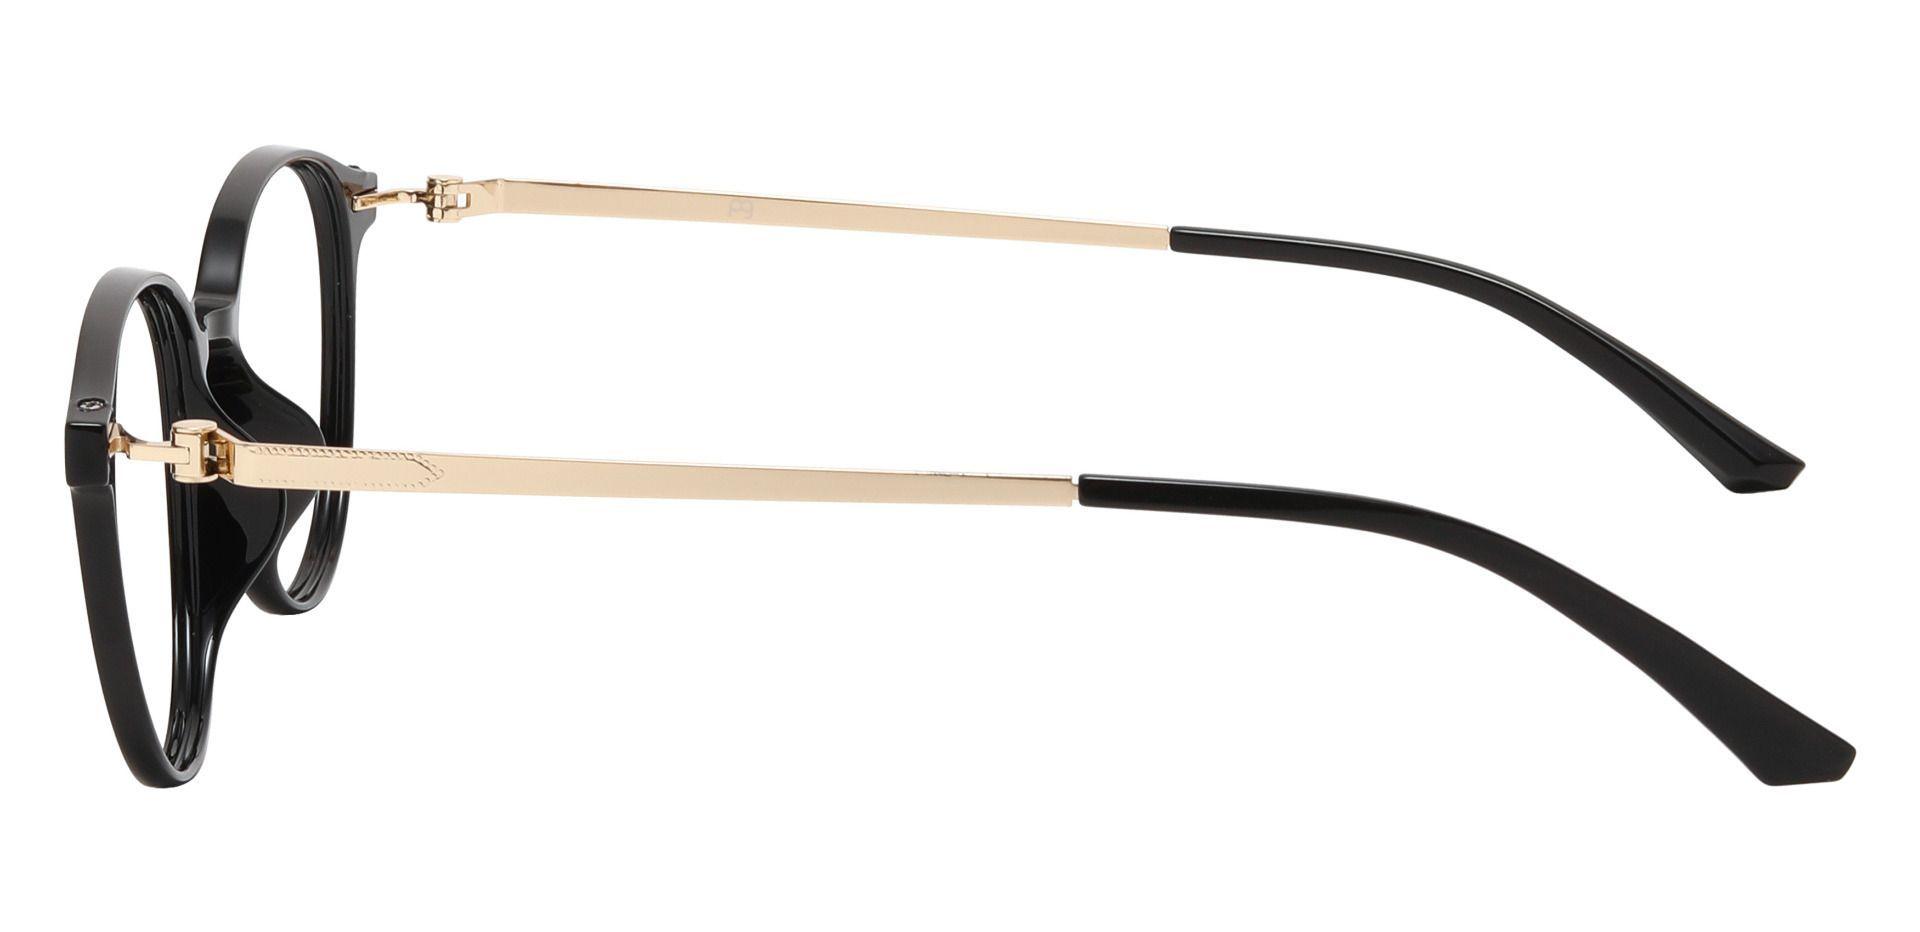 Springer Round Prescription Glasses - Black